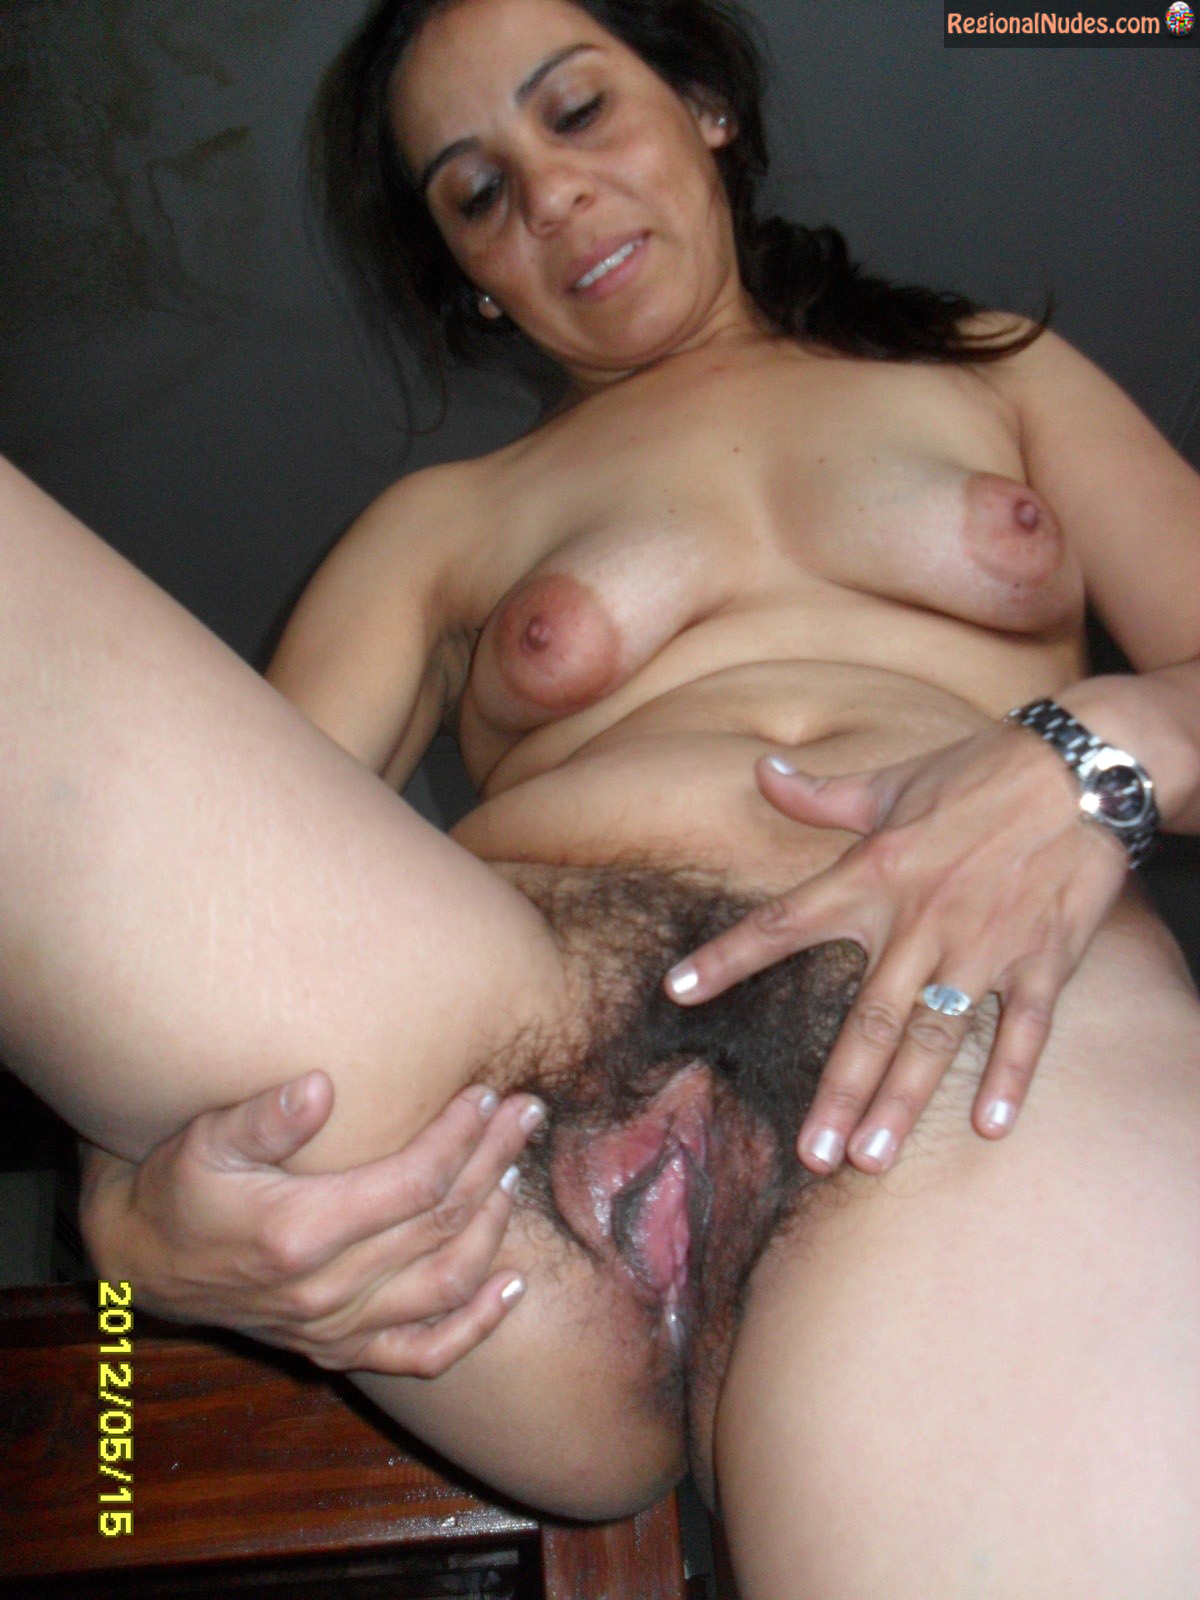 Fat Latina Pussy Pics